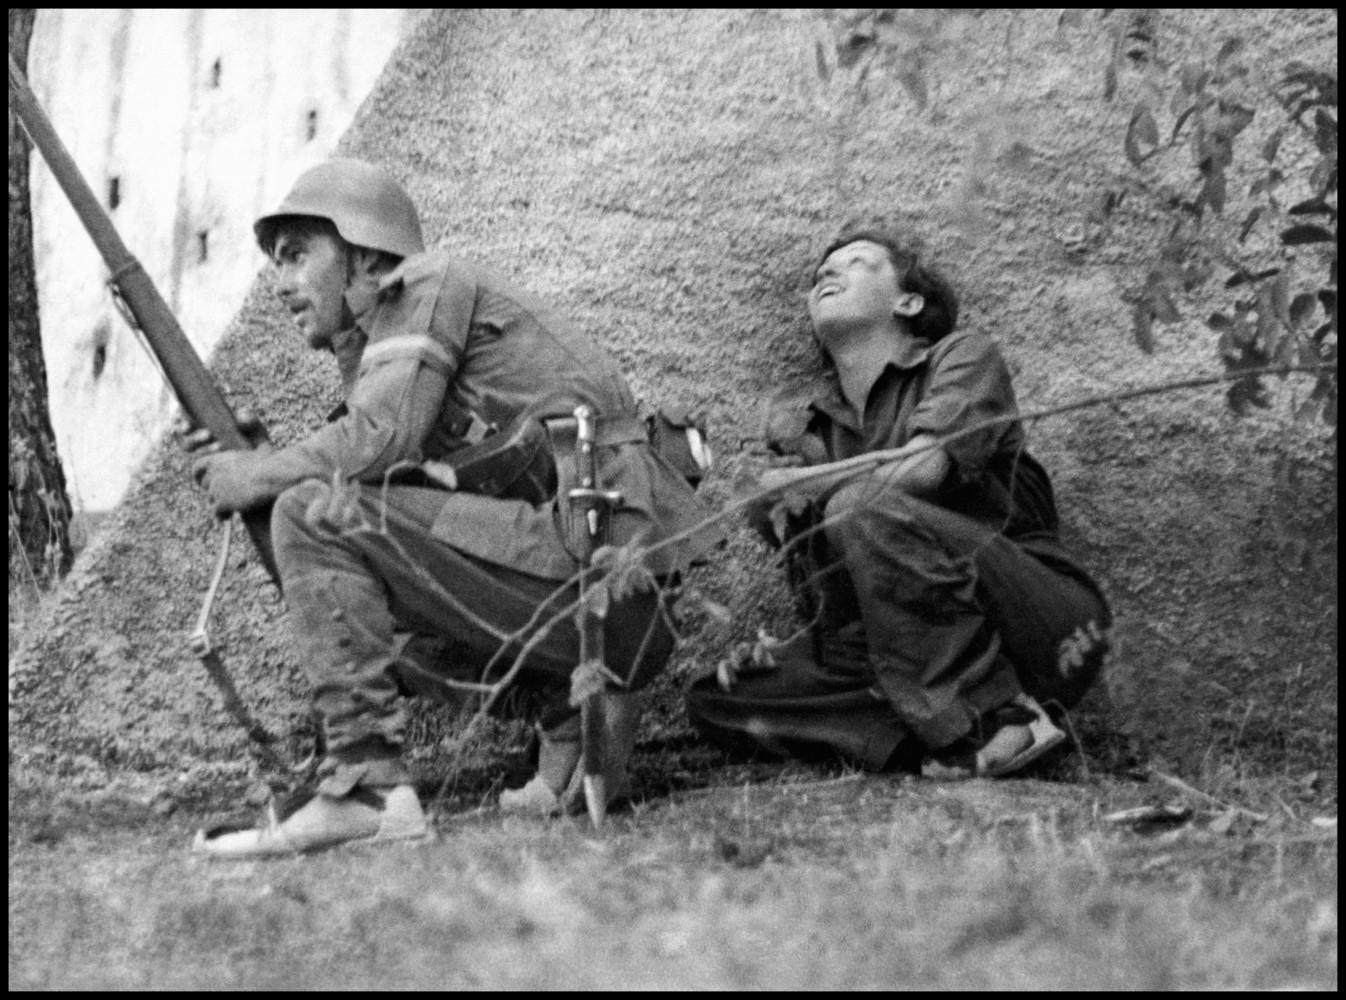 Gerda Taro: The First Woman War Photographer to Die in the Field